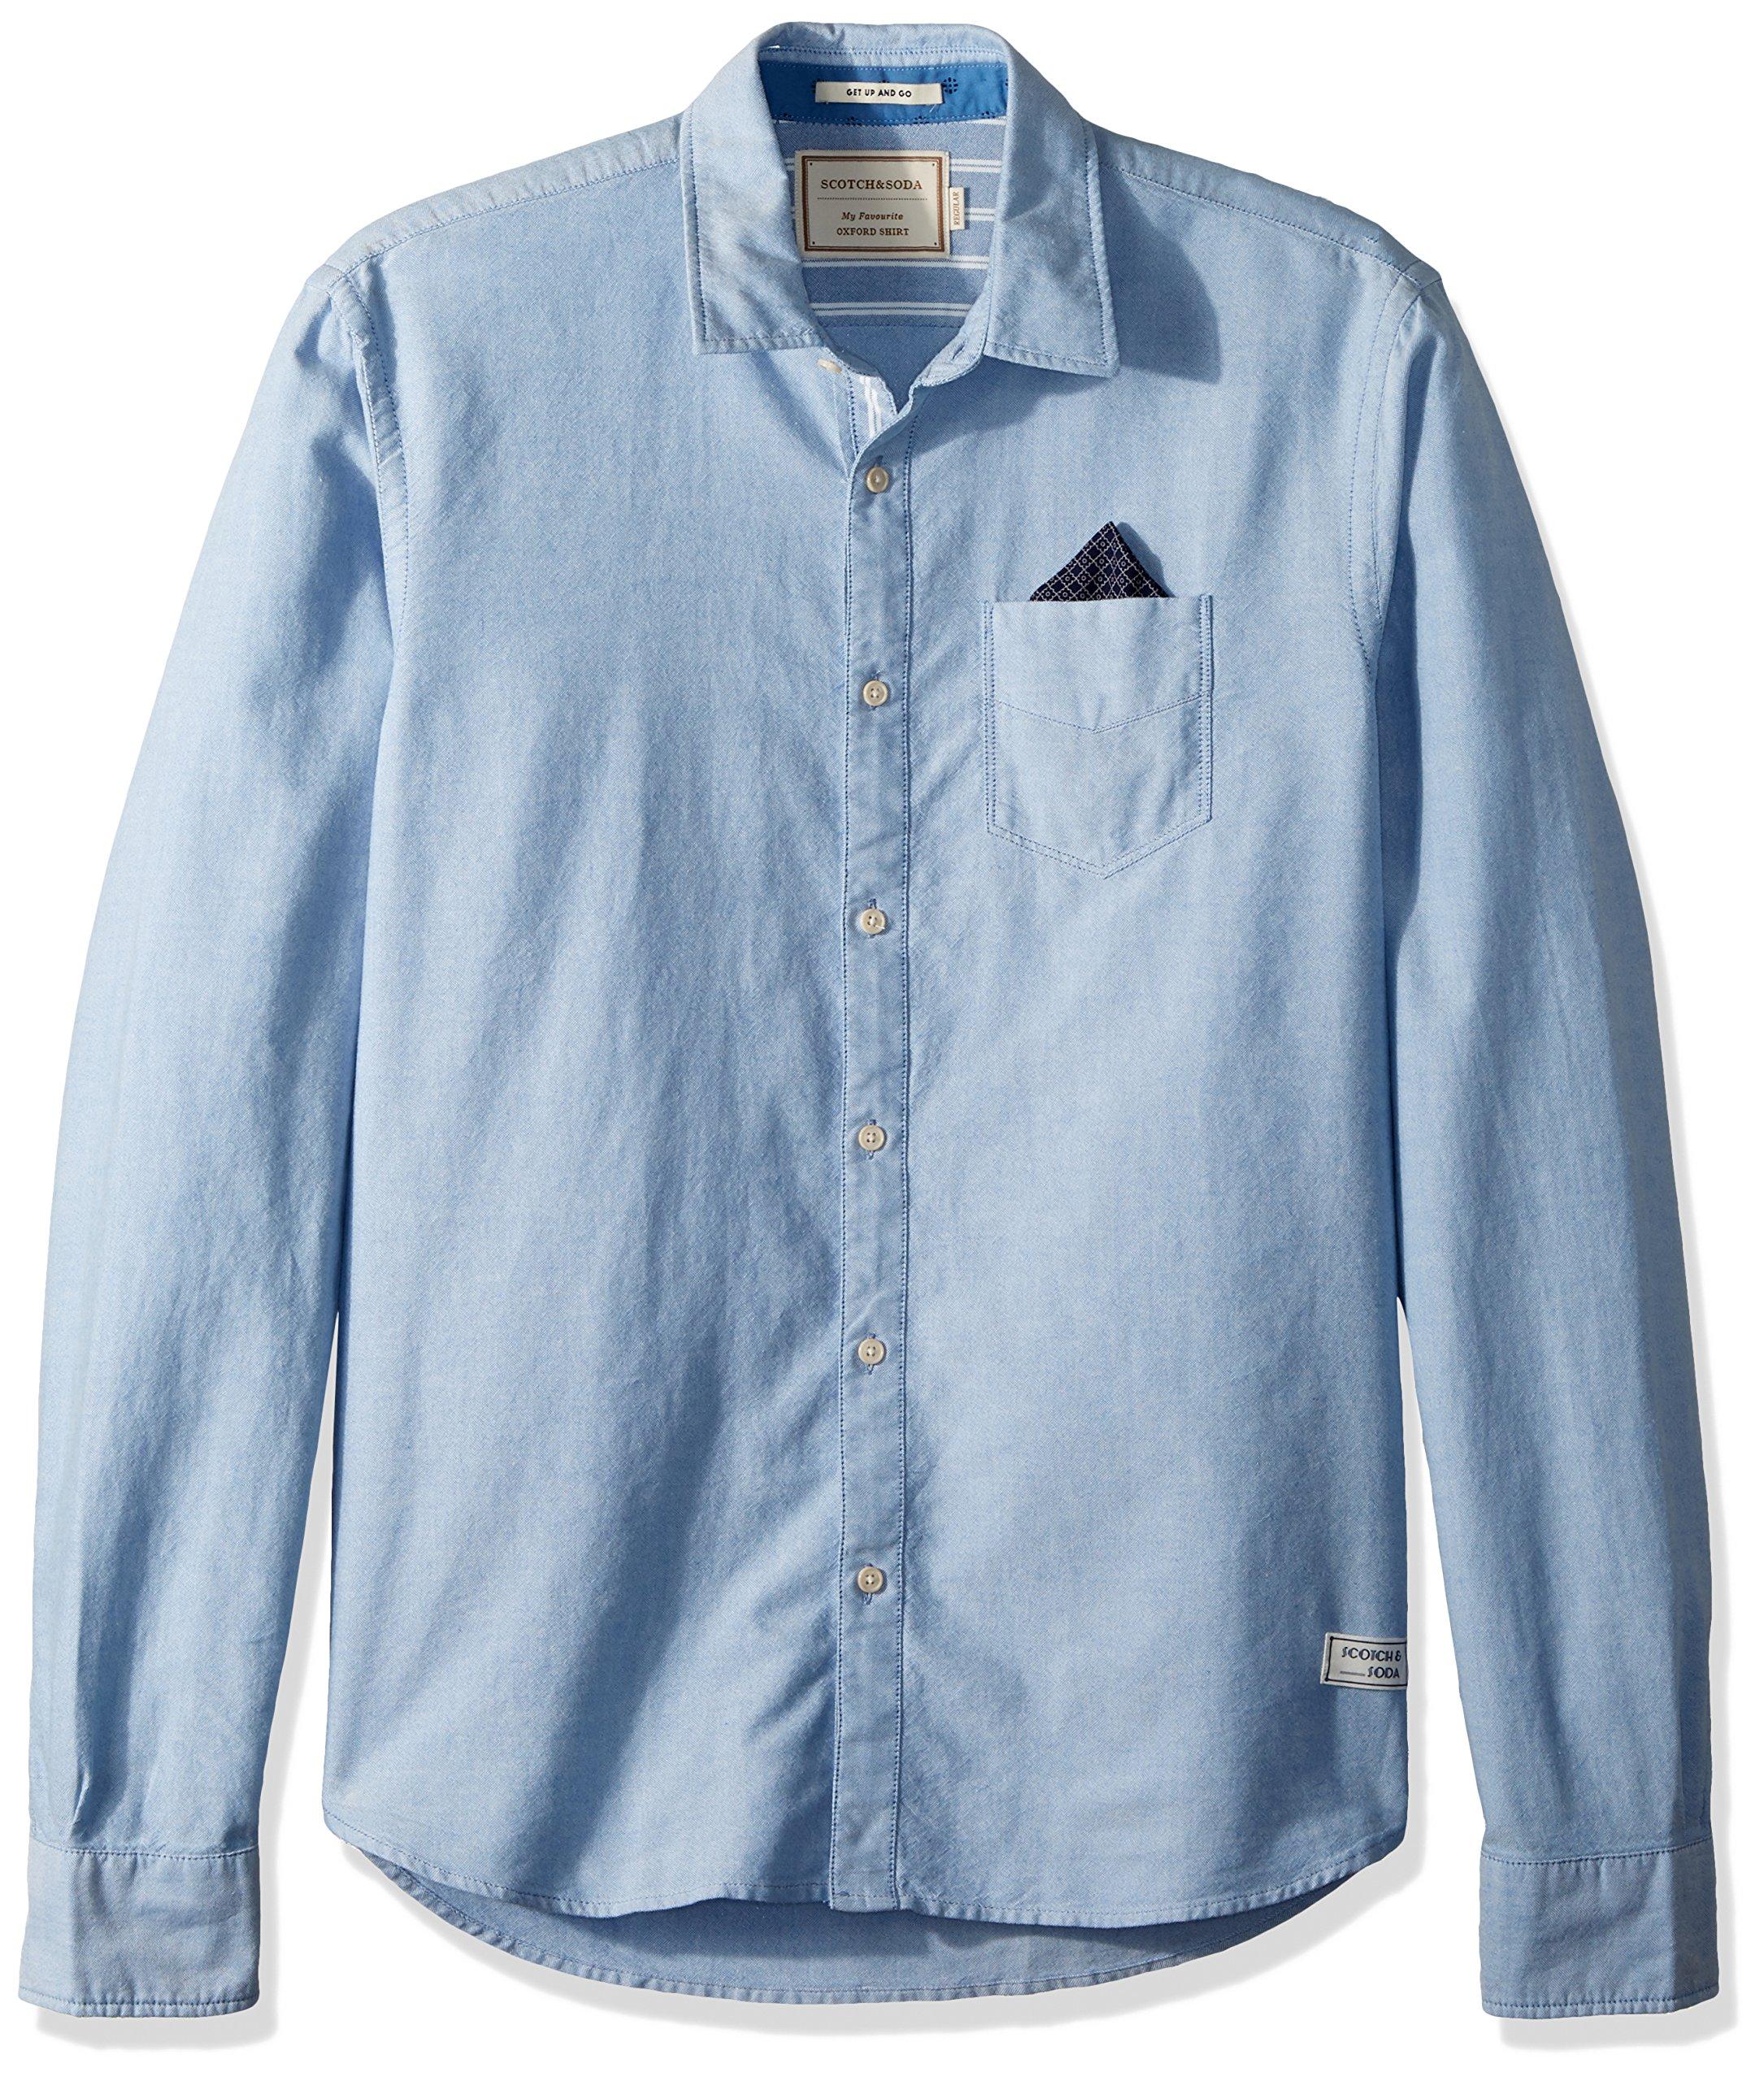 Scotch & Soda Men's Oxford Shirt With Chestpocket and Detachable Pochet, Blue, L